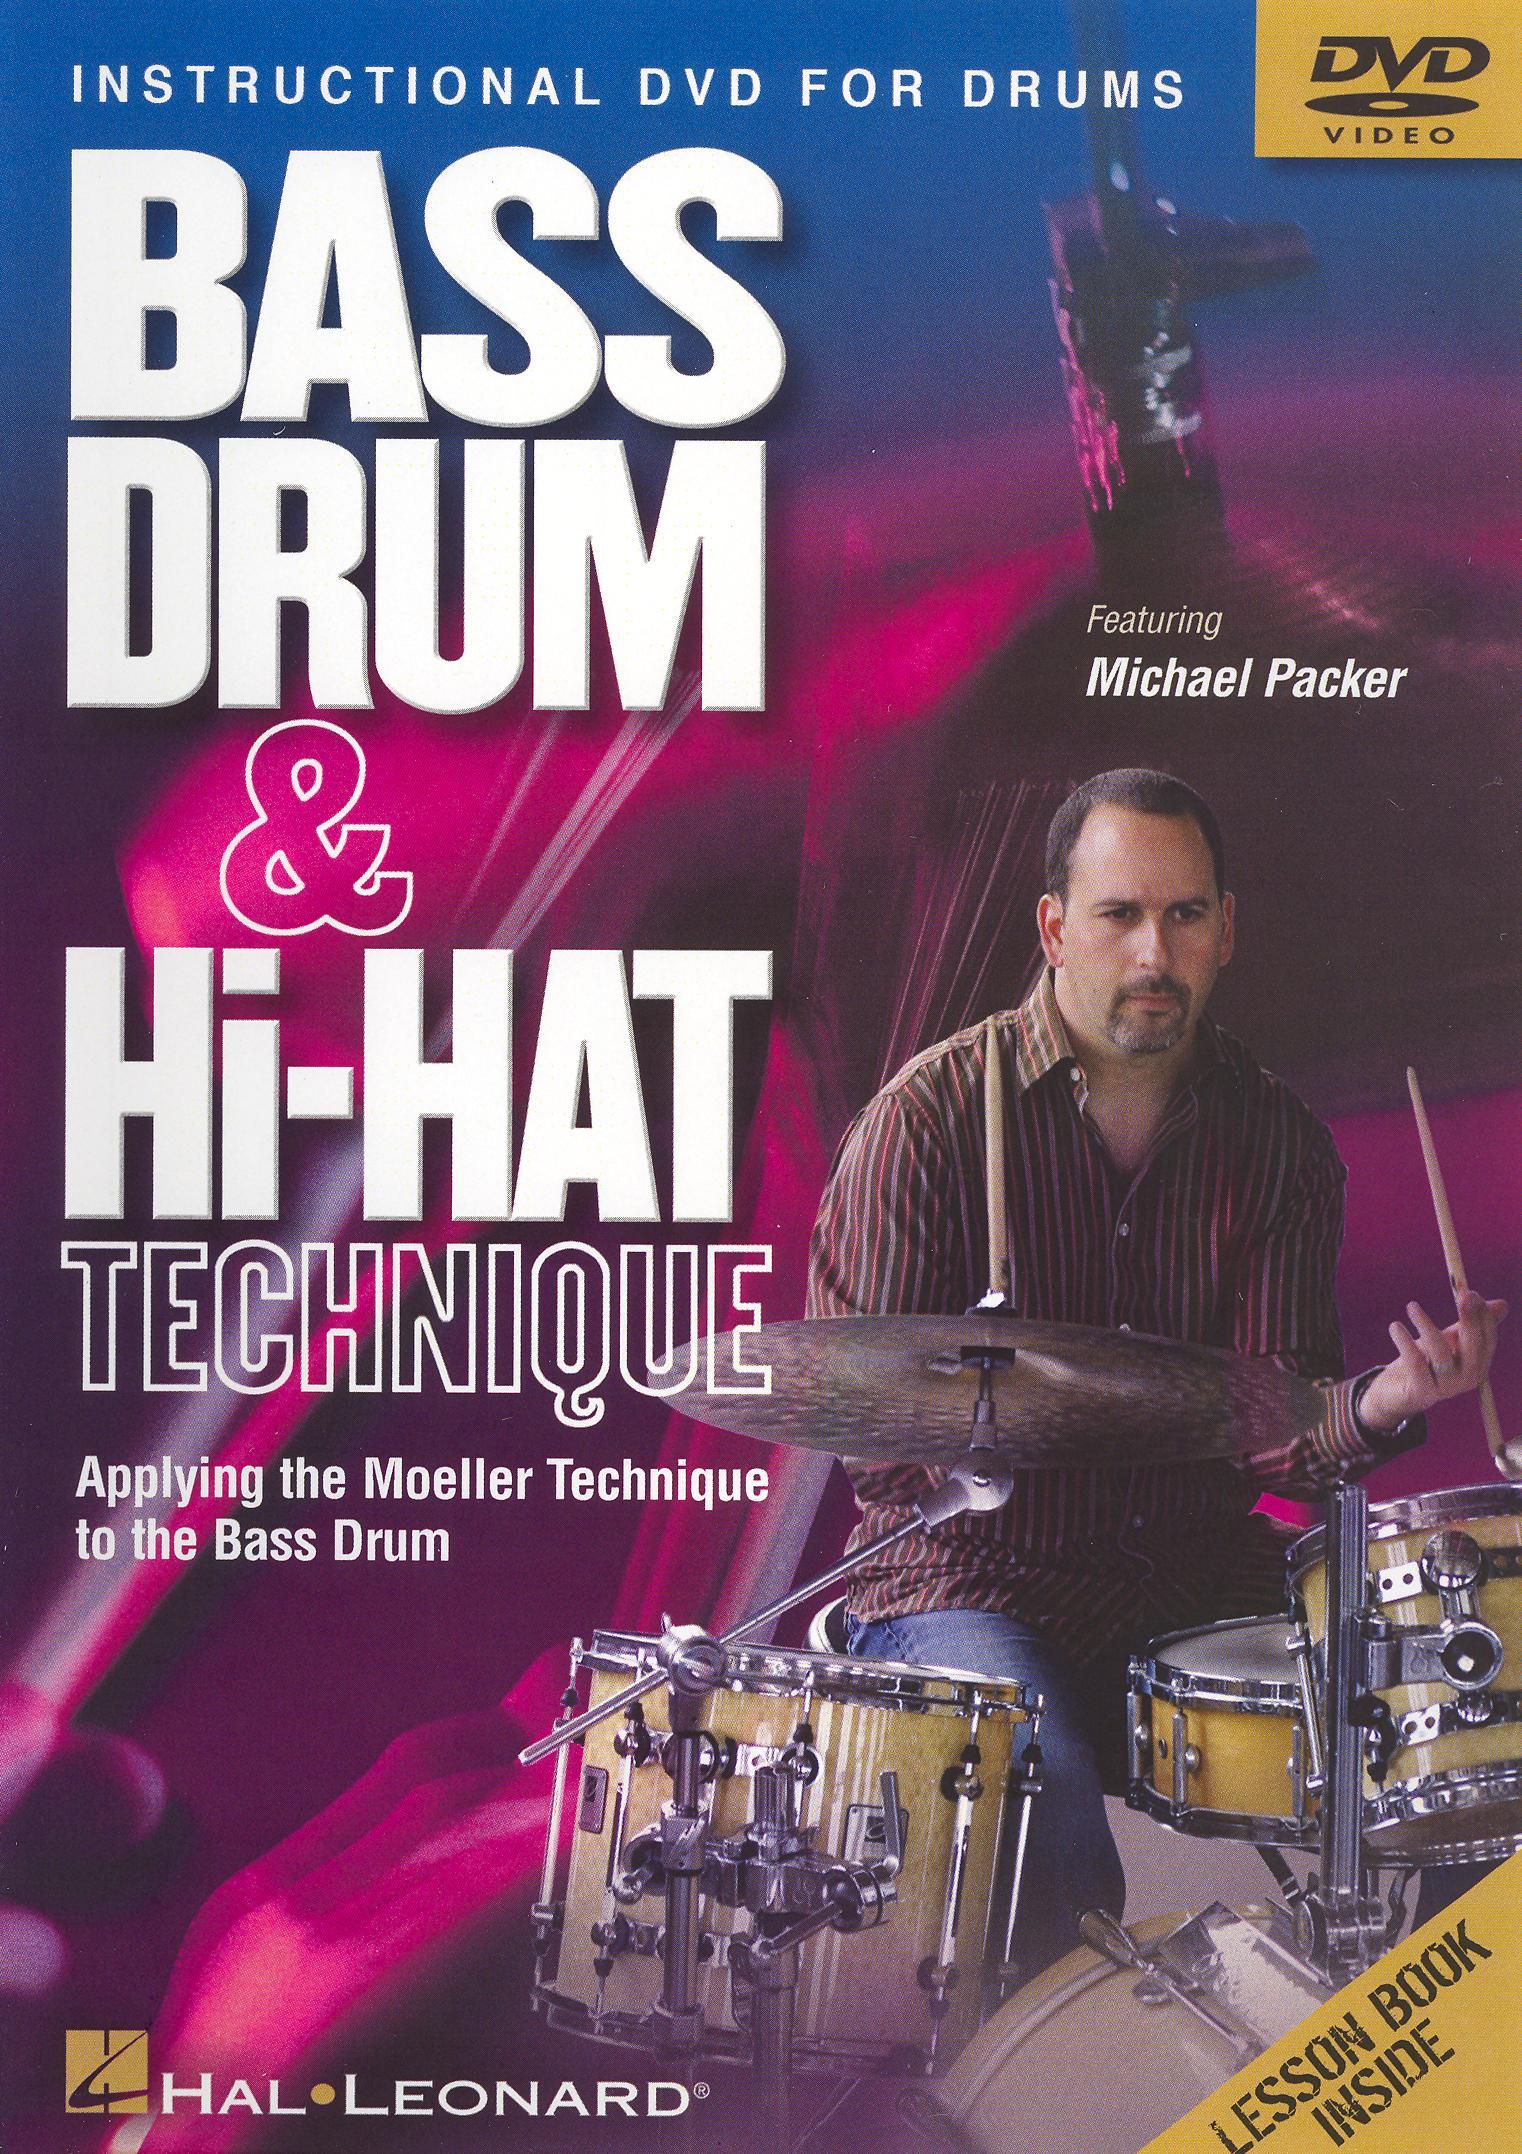 Michael Packer: Bass Drum and Hi-Hat Technique